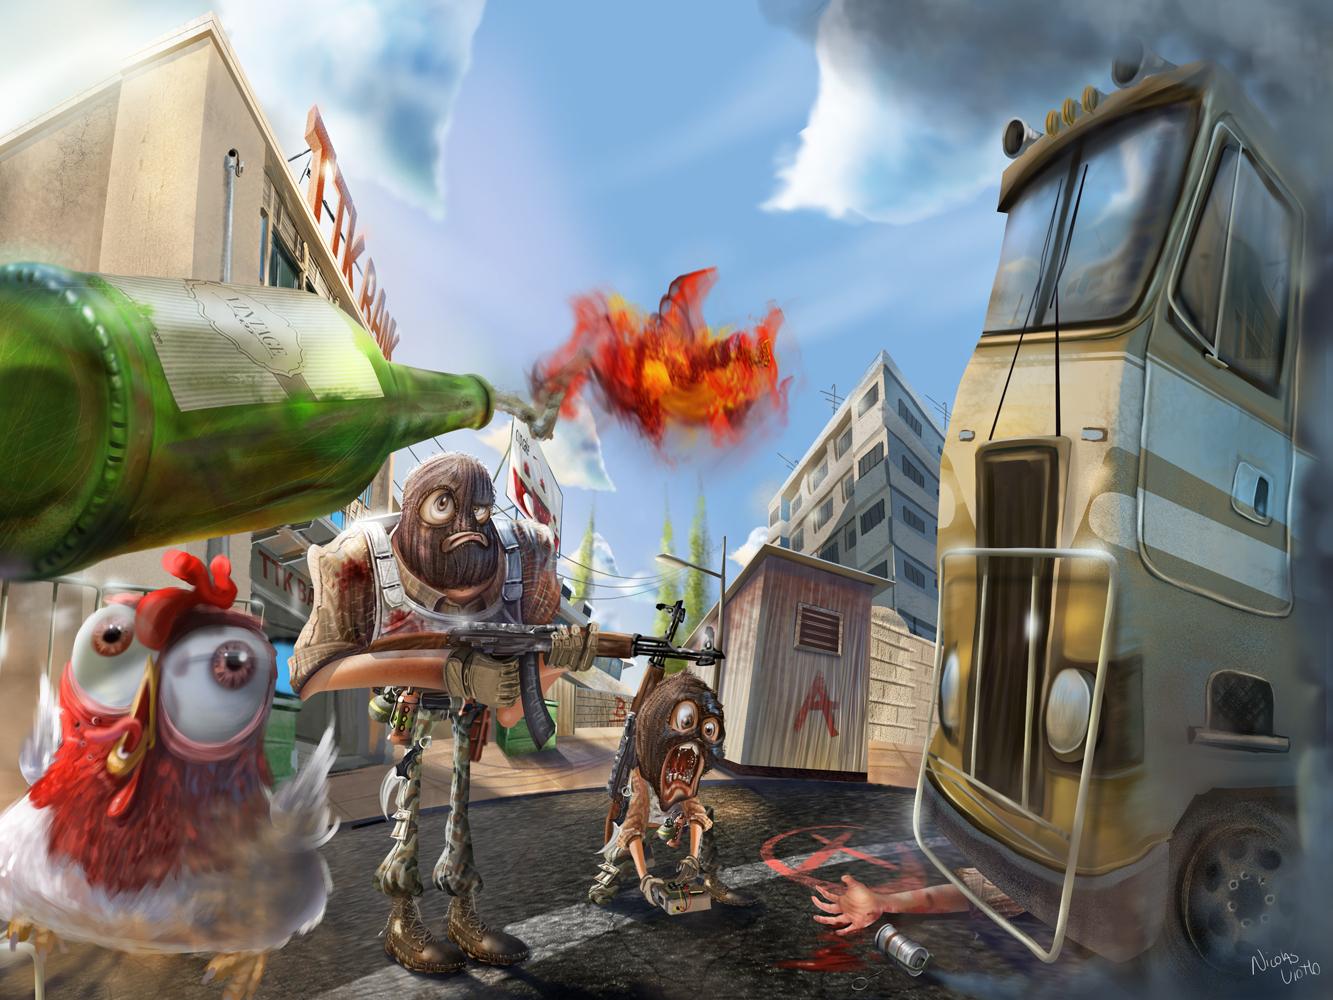 Ilustra Game - Cs Go by Nicolas Viotto | Dribbble | Dribbble